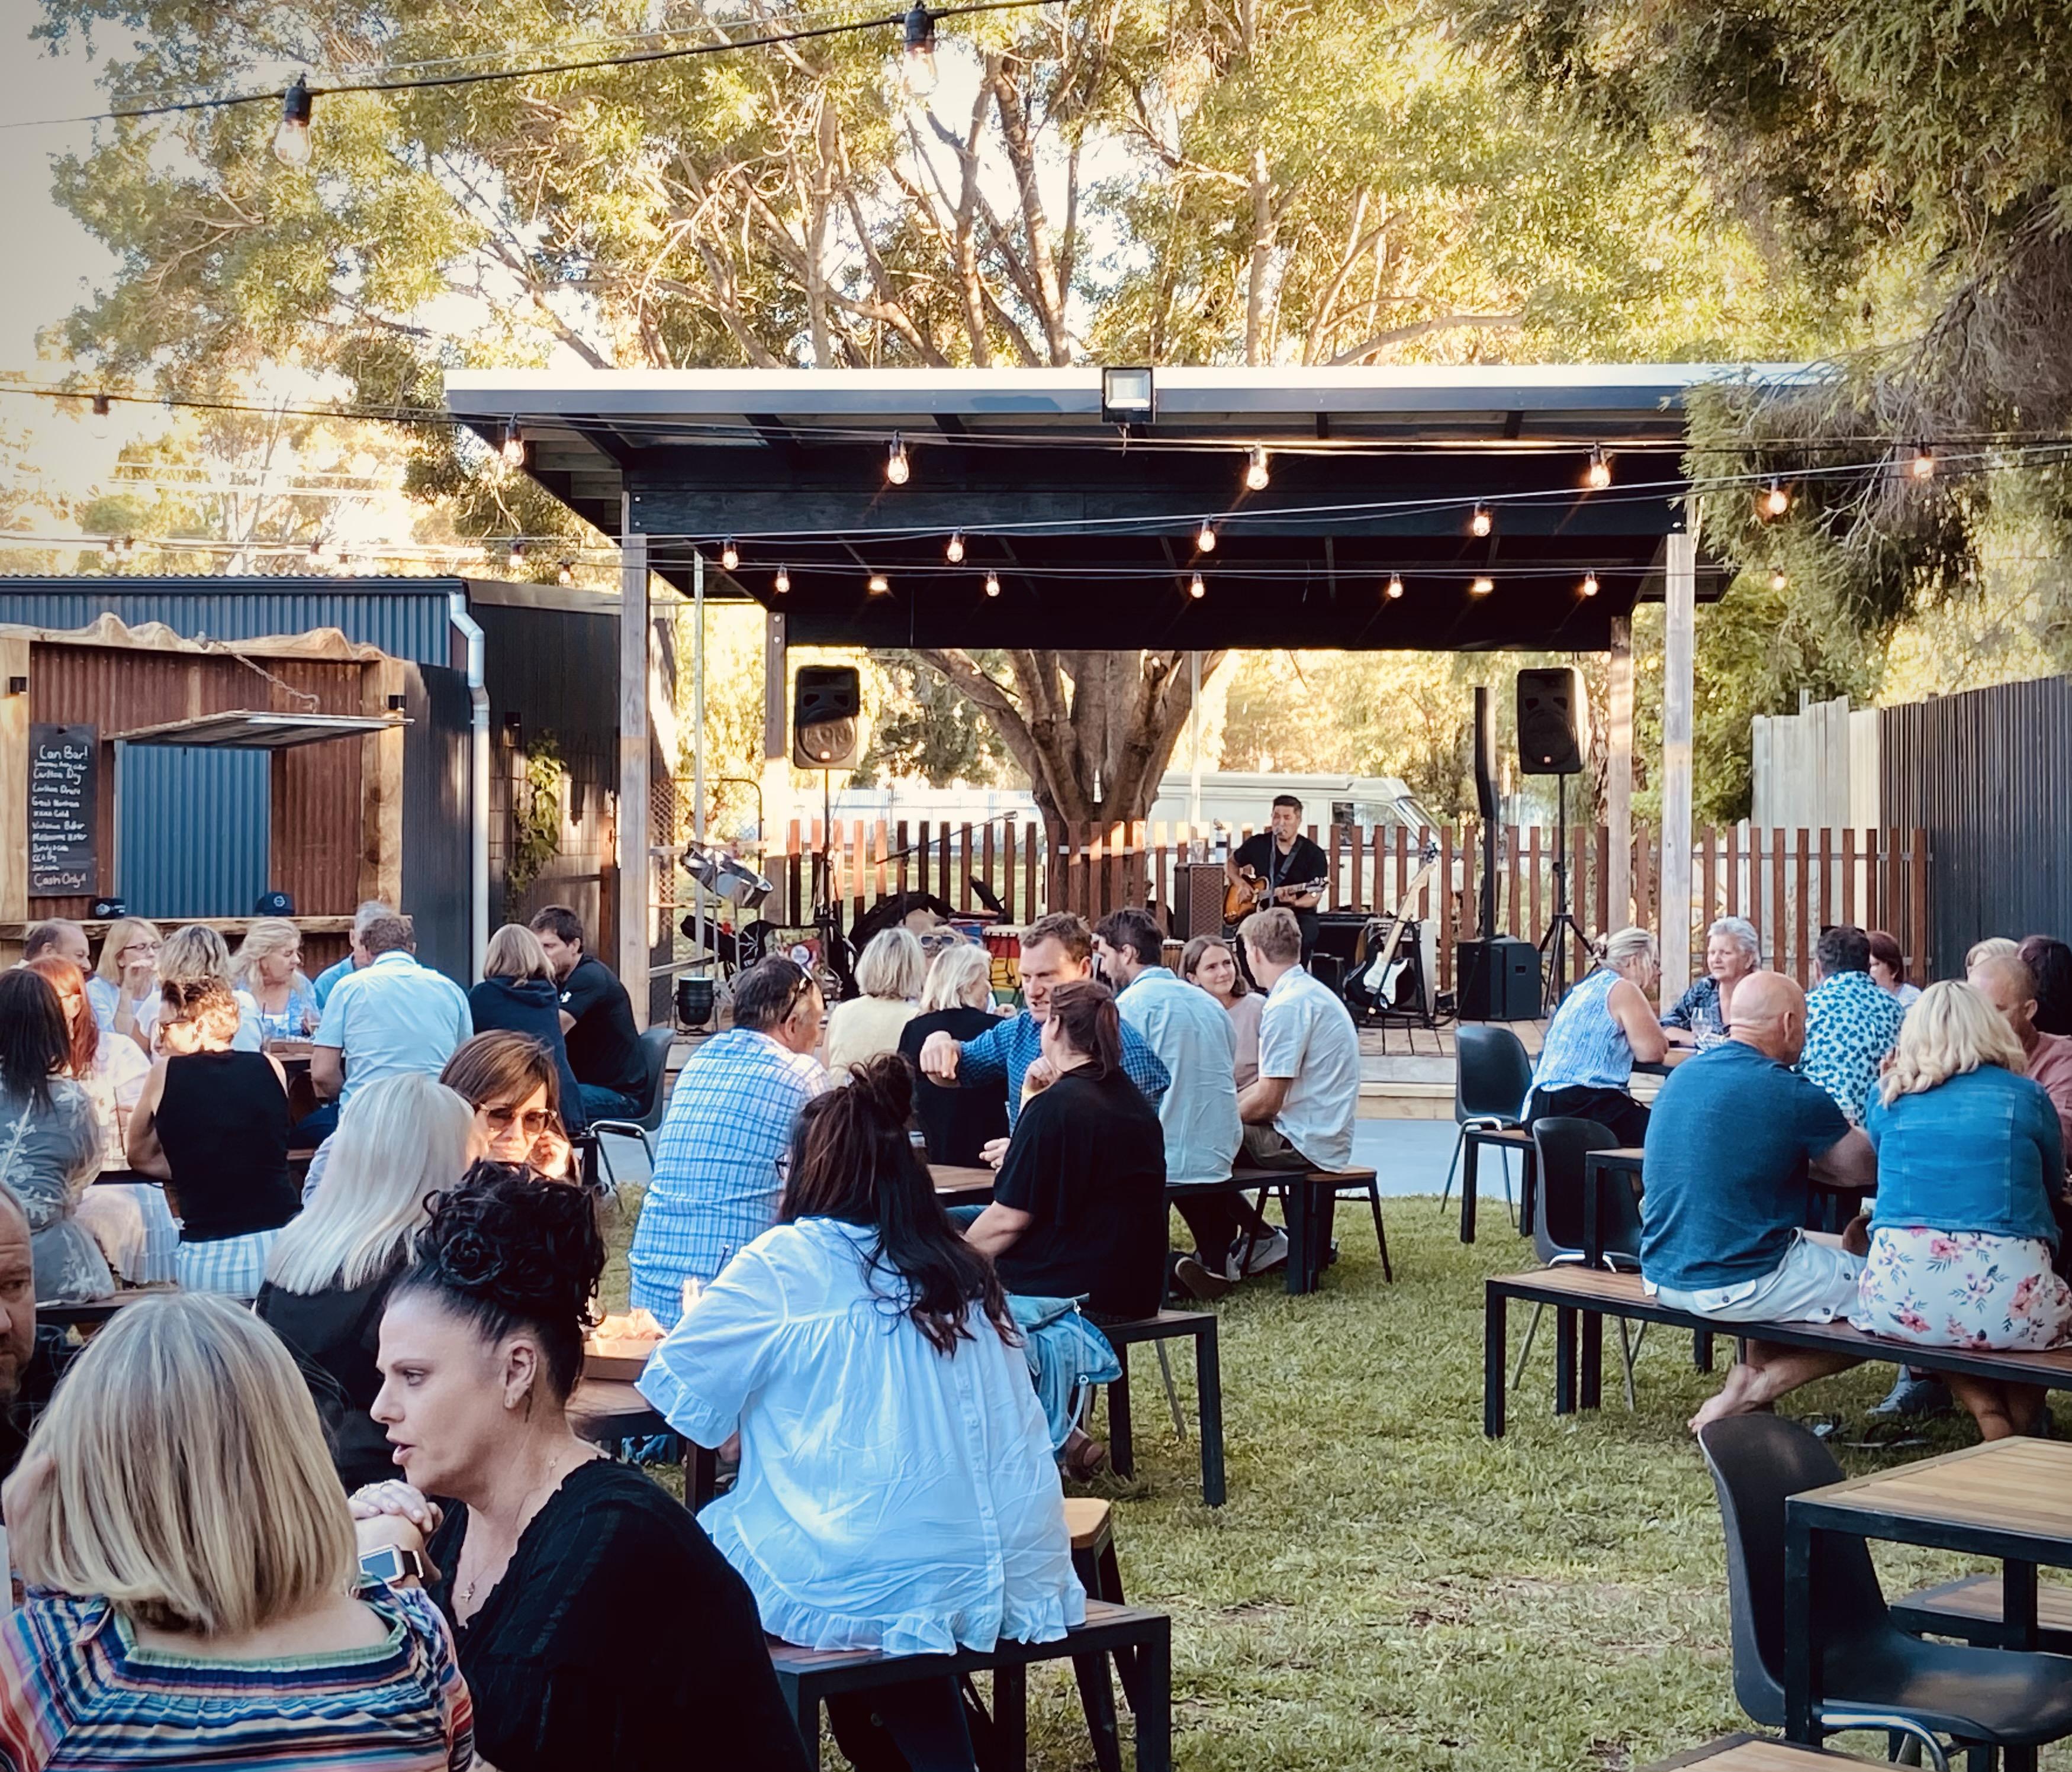 http://www.balldalehotel.com.au/wp-content/uploads/2021/01/Beergarden-Nov-2020.jpg